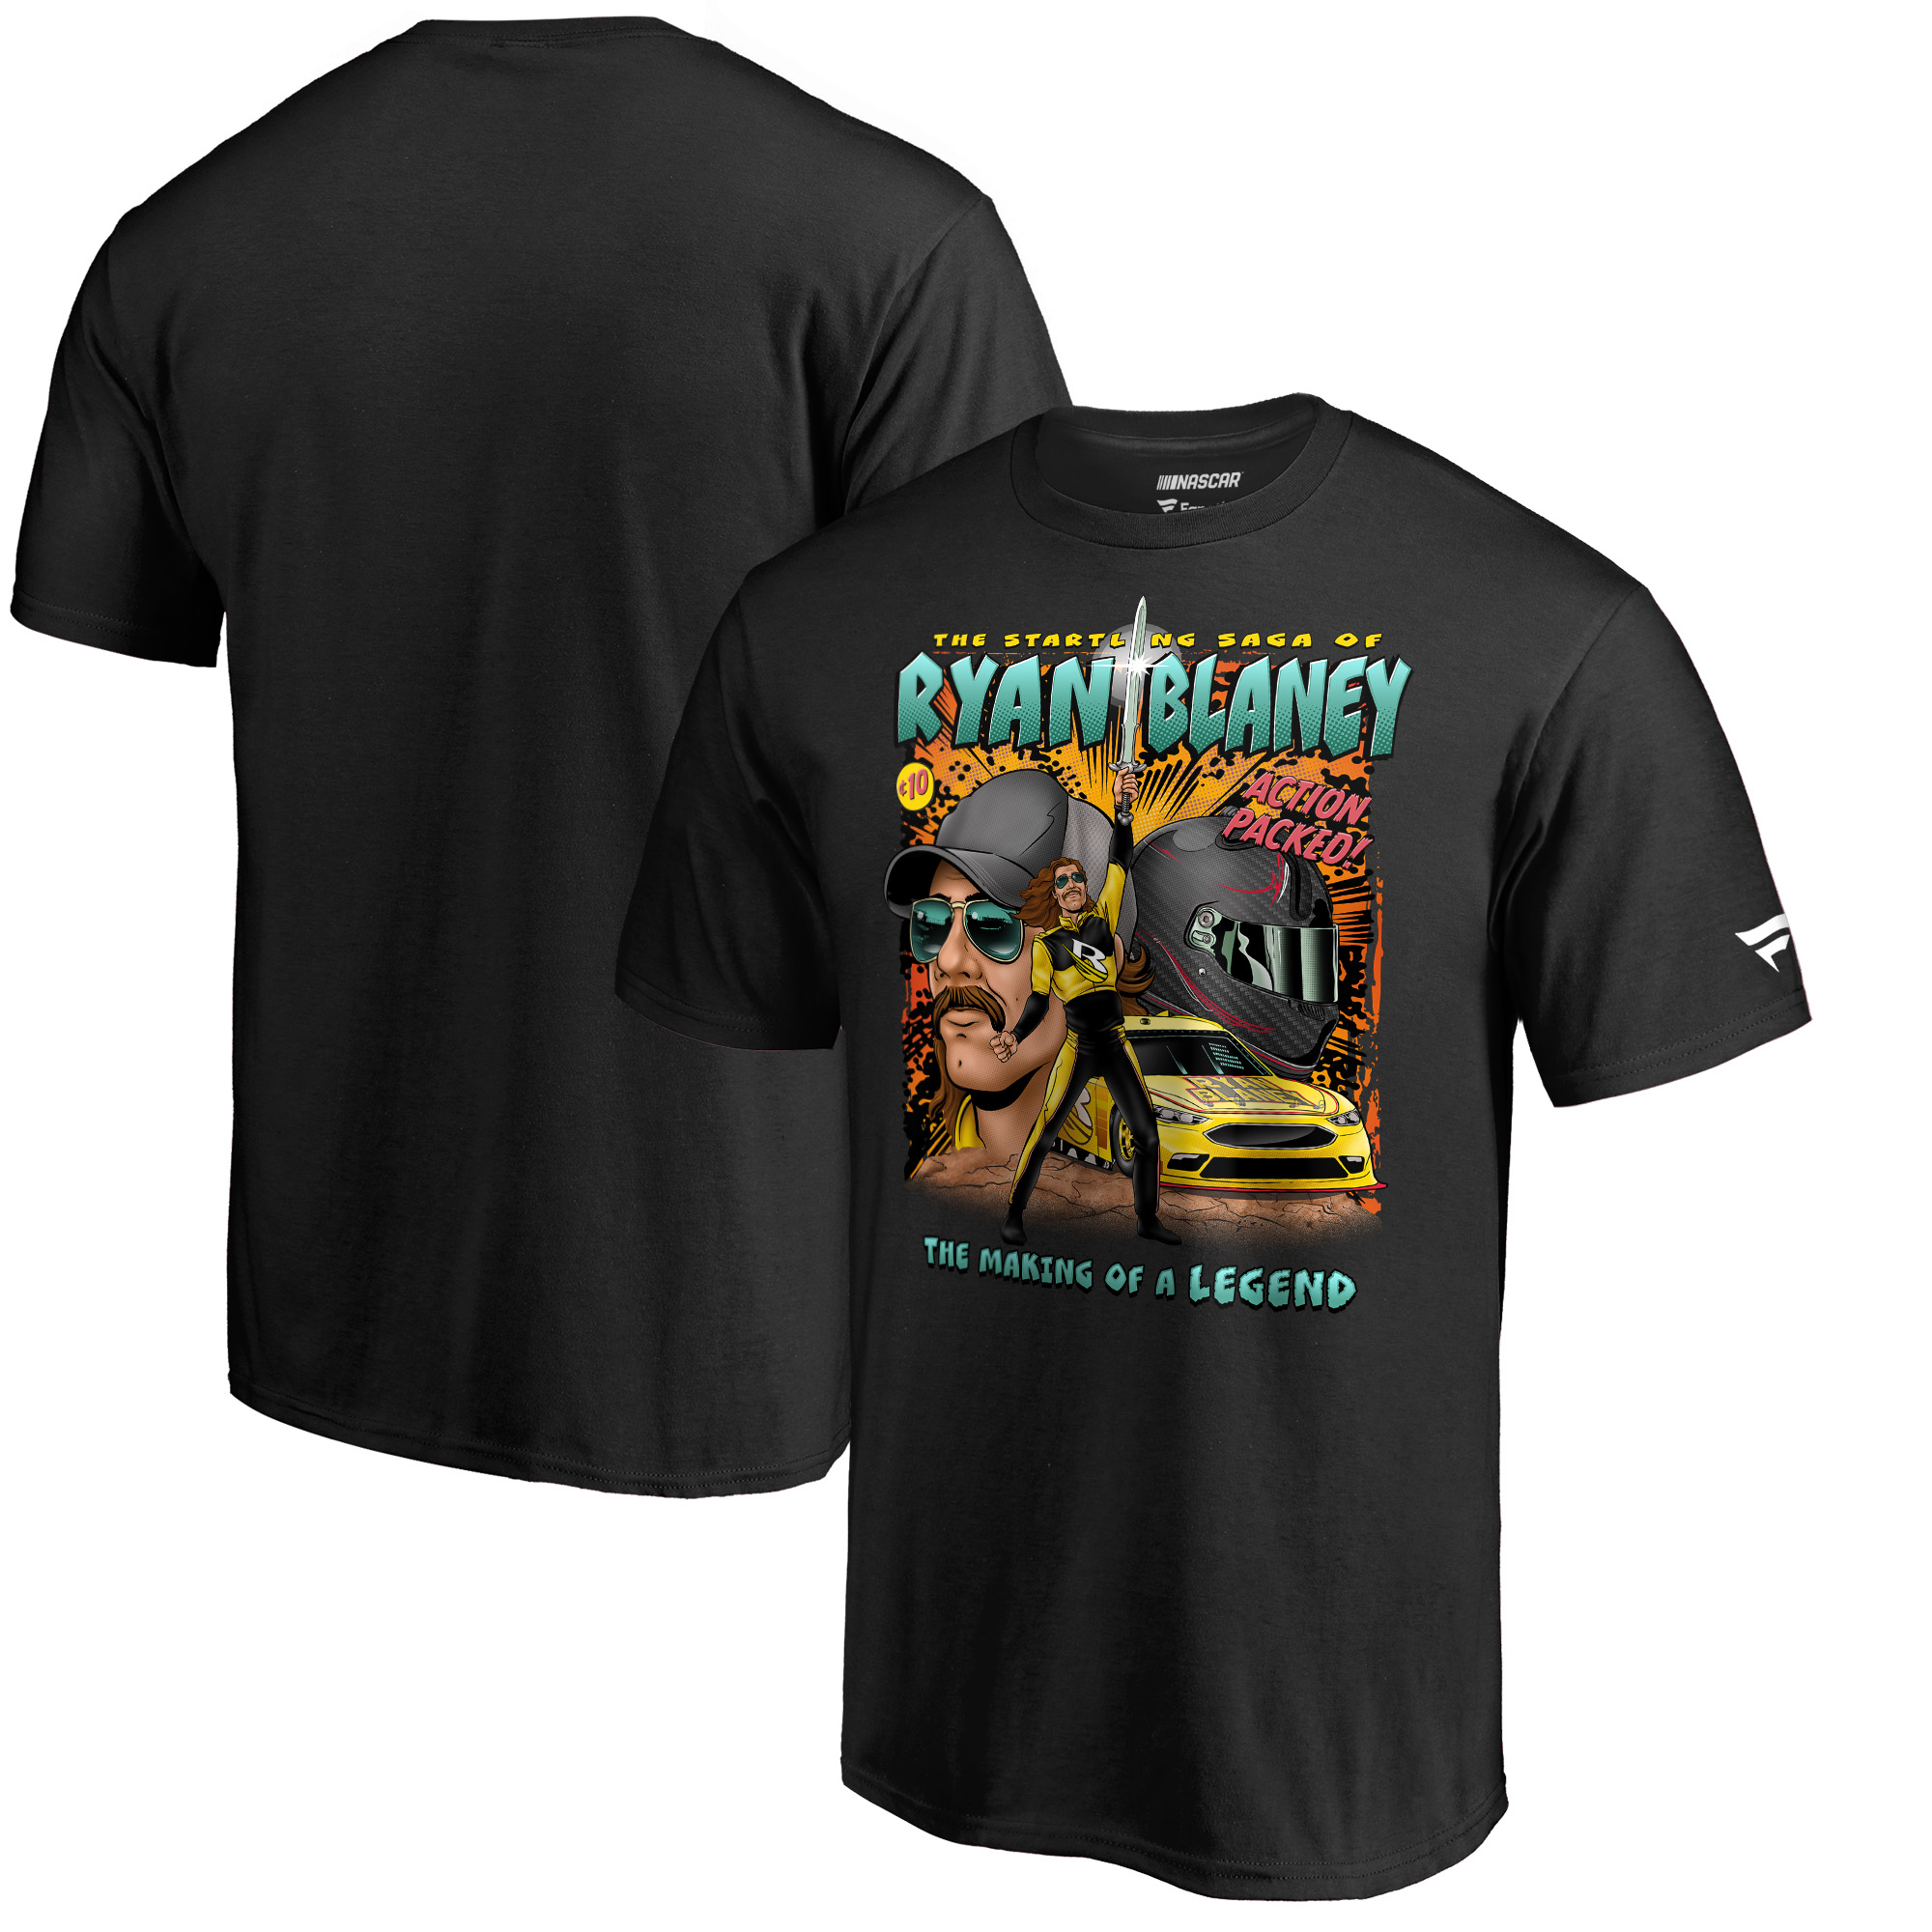 Ryan Blaney Fanatics Branded Comic Book Lifestyle Collection T-Shirt - Black